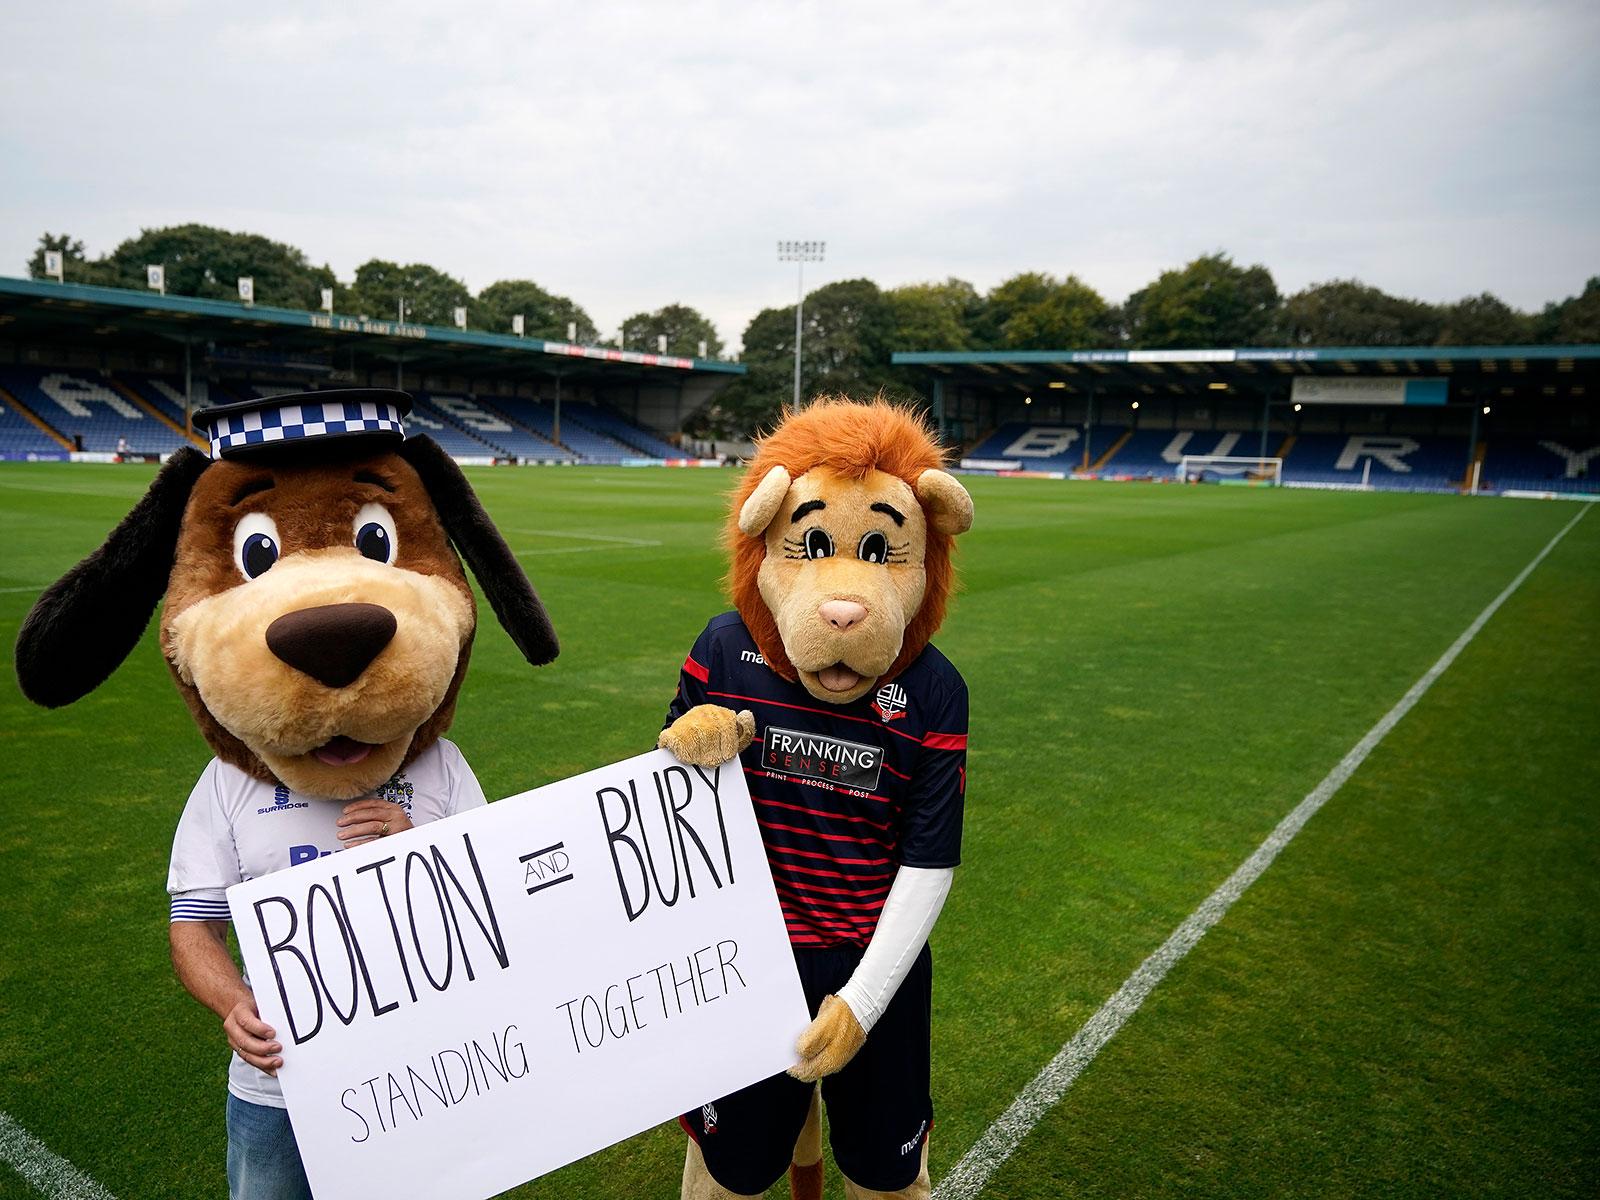 Bolton and Bury face expulsion from the English Football League